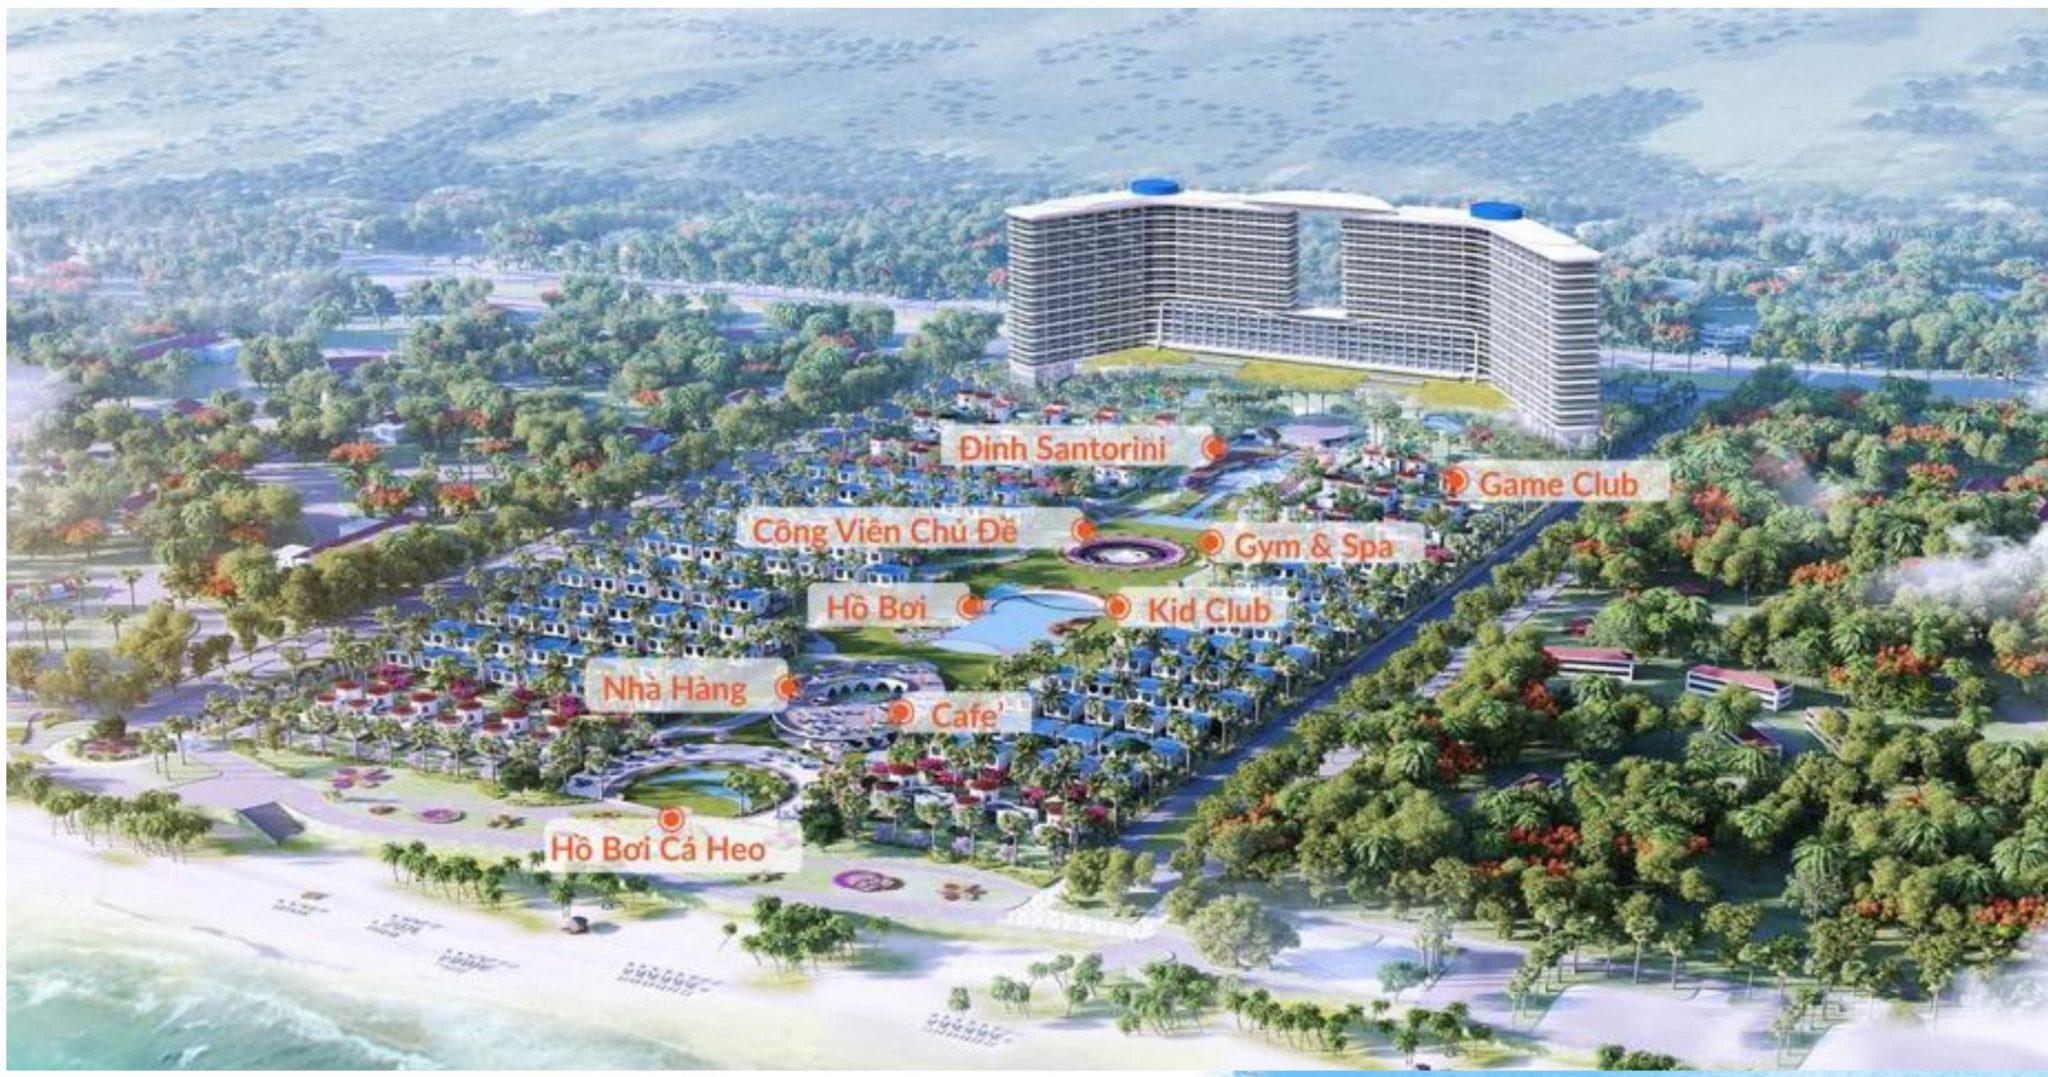 0026 e1563262605625 - Dự án căn hộ condotel Cam Ranh Bay - Pearl Cam Ranh